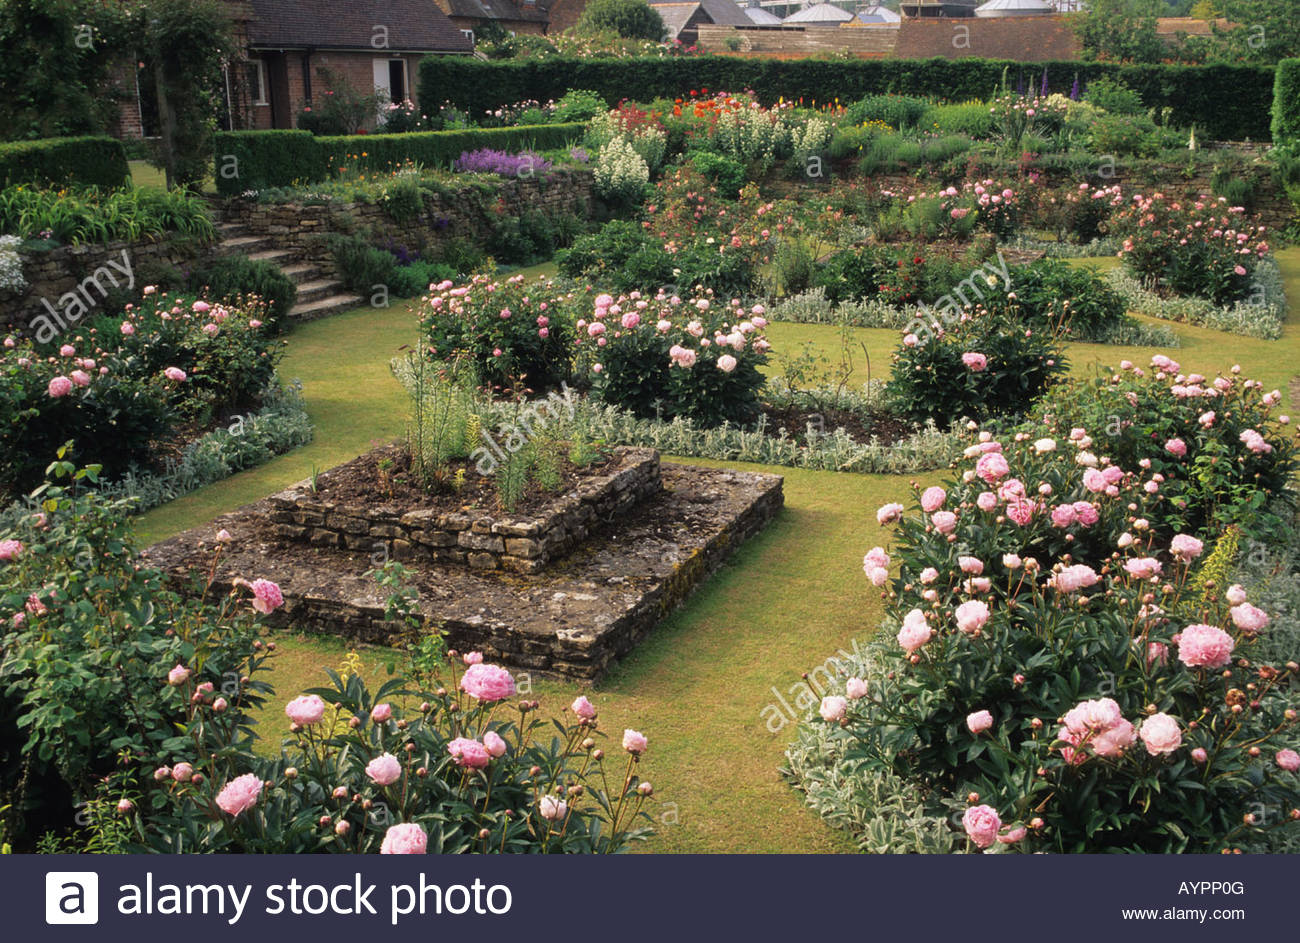 Gertrude Jekyll Gardens >> The Manor House Upton Grey Hampshire sunken garden Gertrude Jekyll Stock Photo, Royalty Free ...